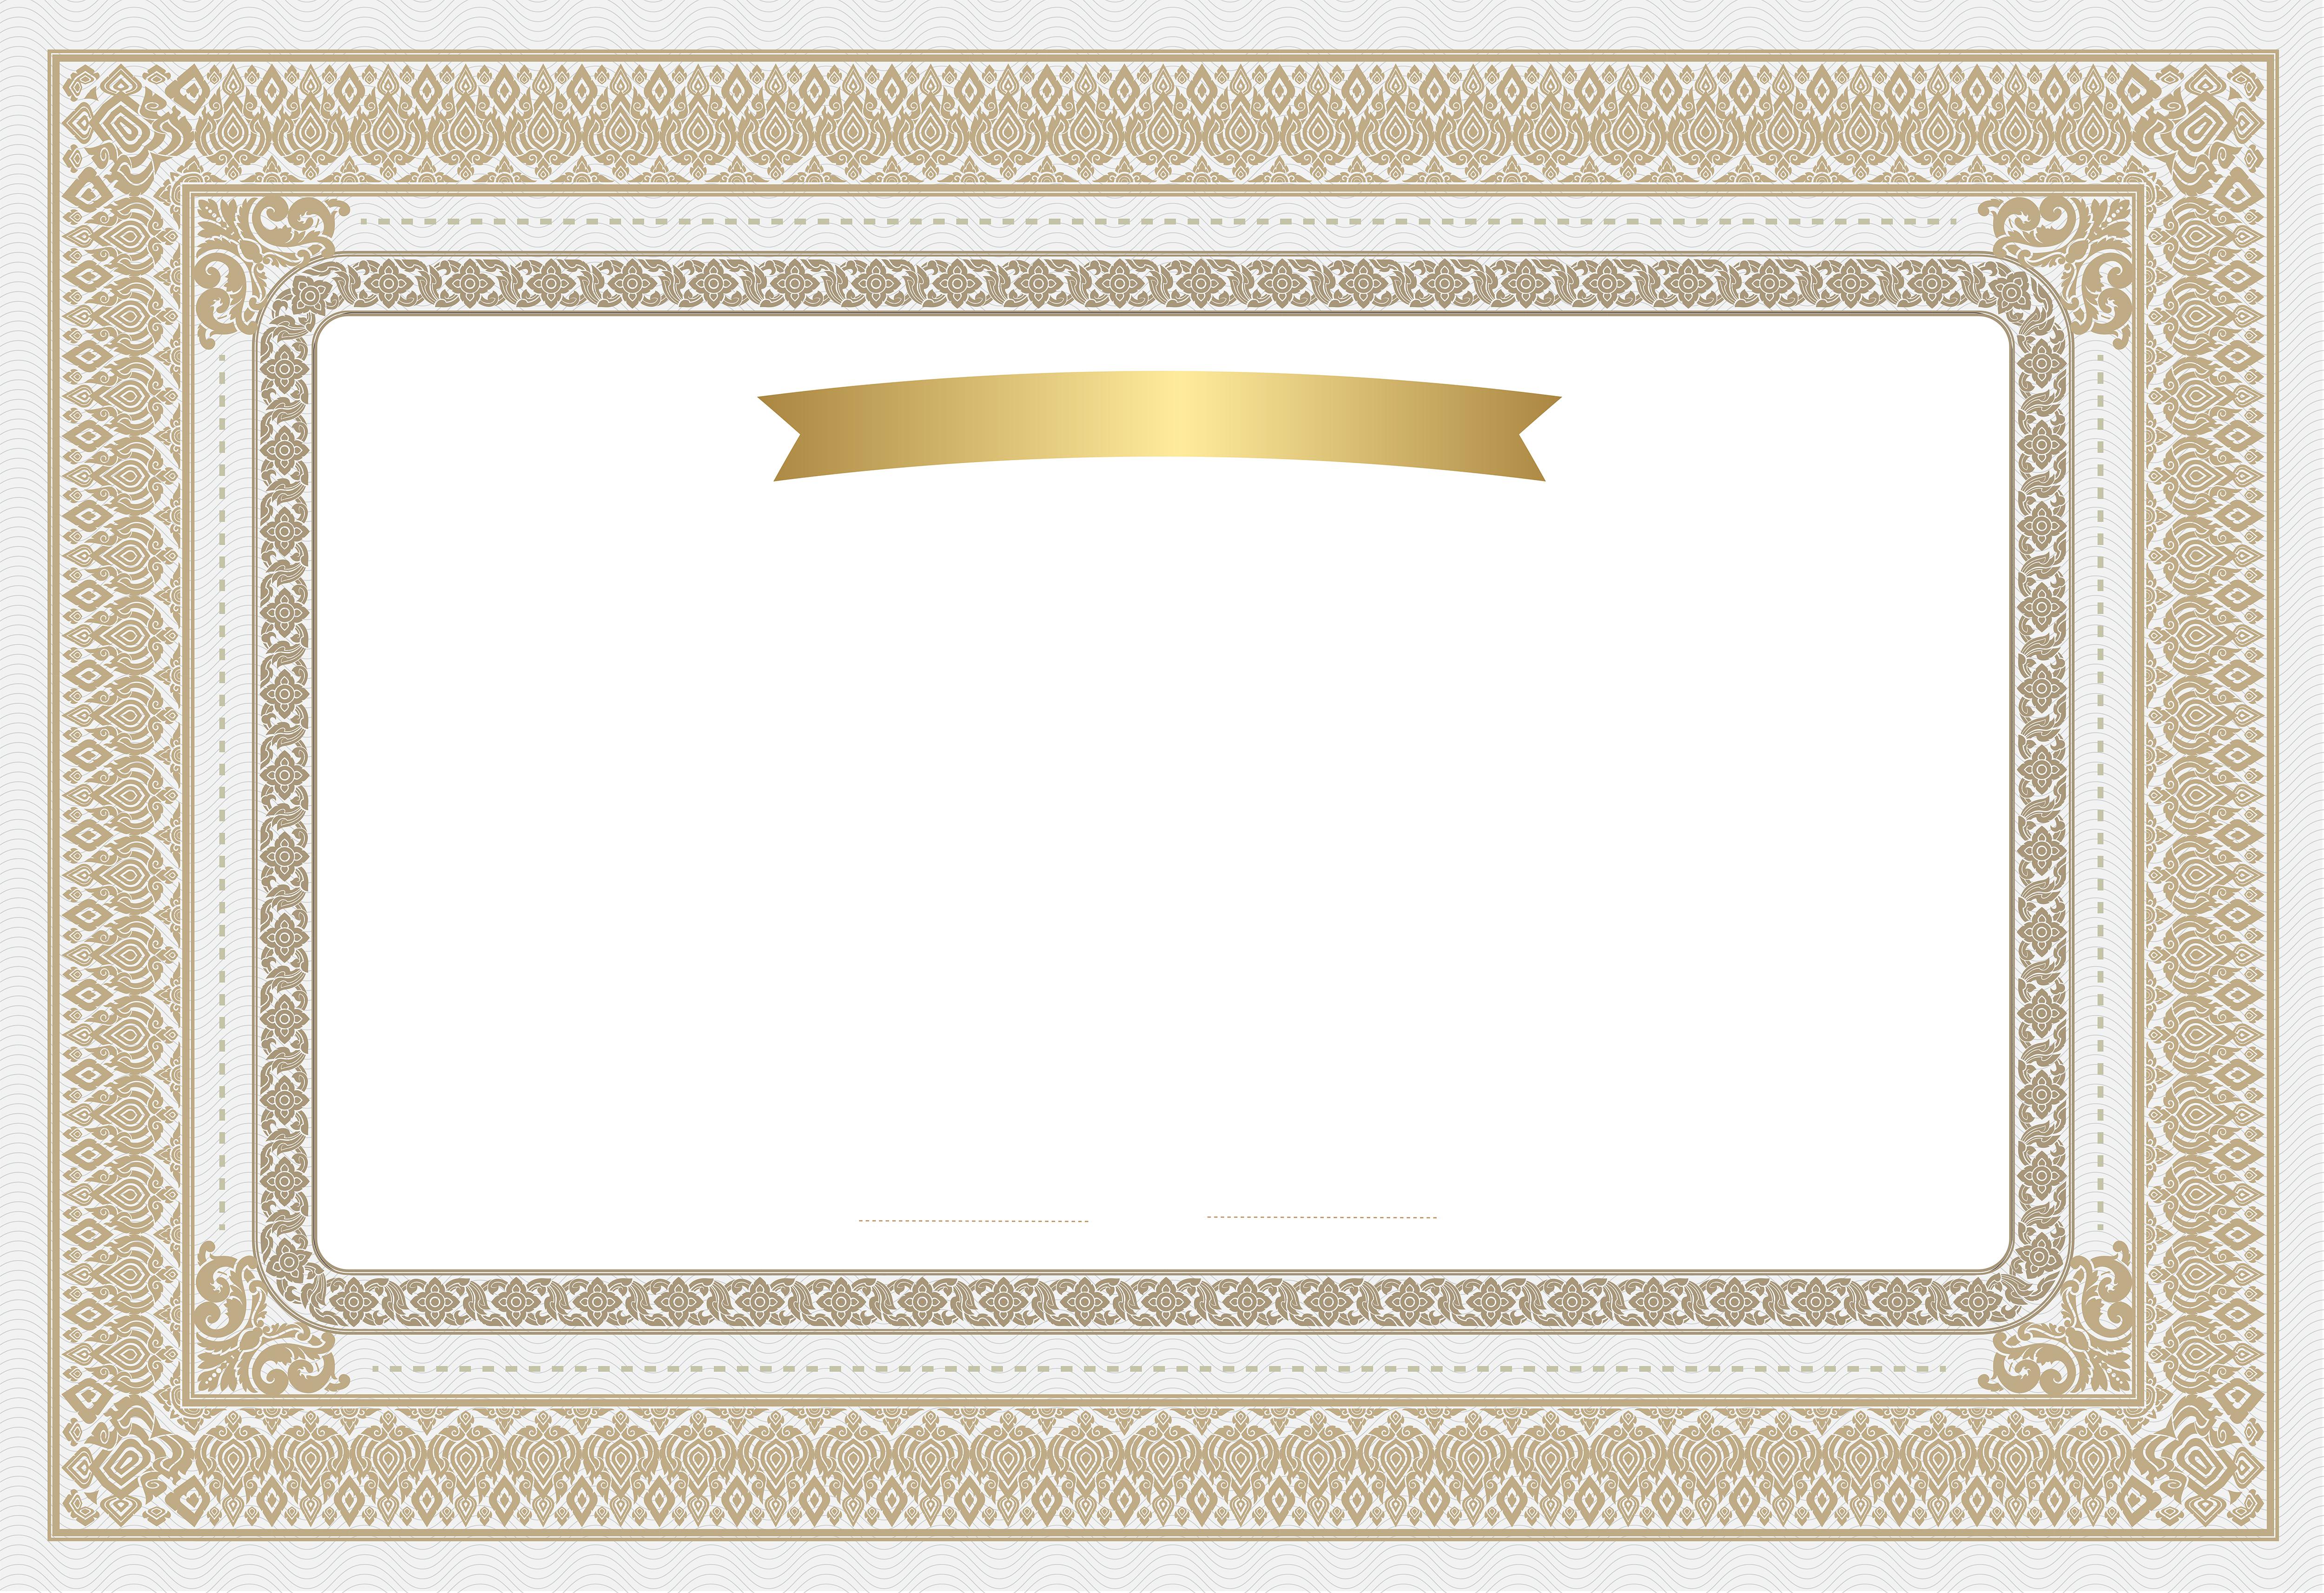 Empty Certificate Clip Art Image.